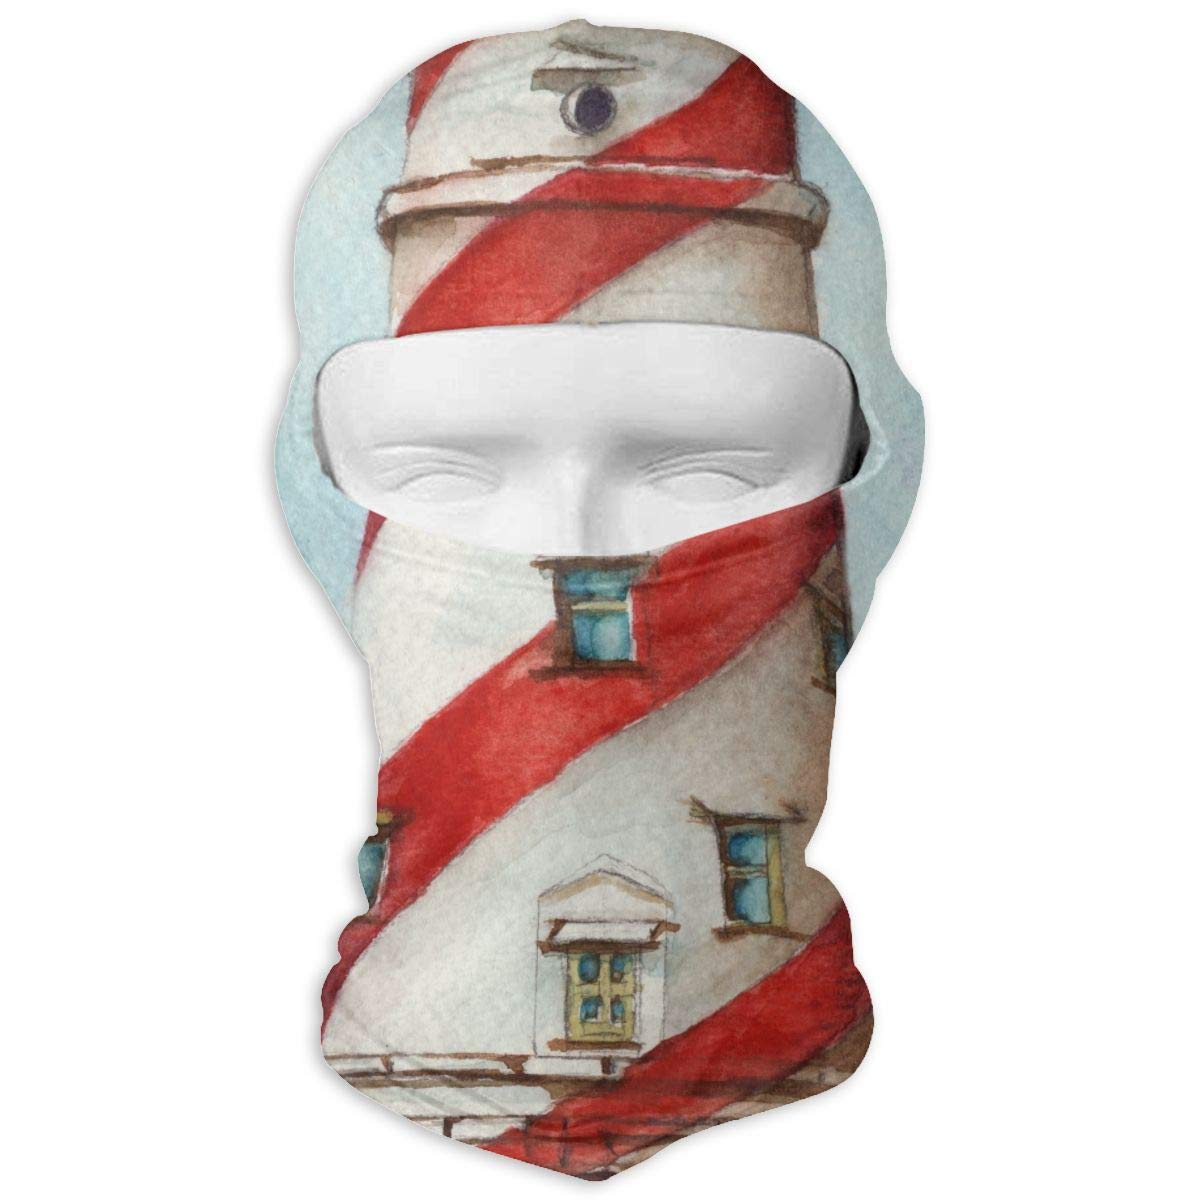 LaoJi Lighthouse Painting Winter Ski Mask Balaclava Hood Wind-Resistant Face Mask